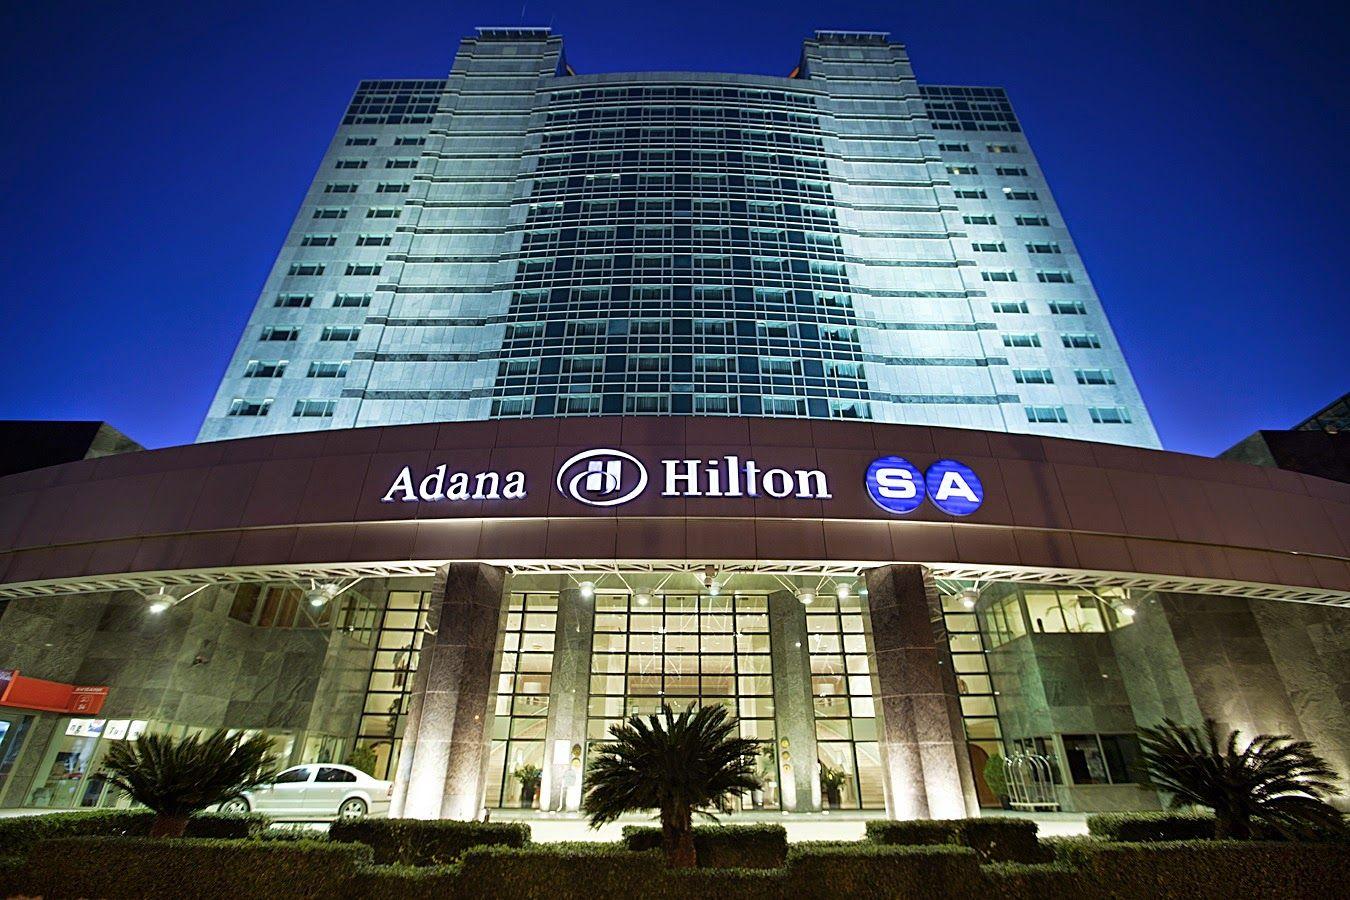 The Extravagant Hilton Adana Turkey Pinned By Www Doubletreetorrance Com Riverside Hotel Adana Hotel